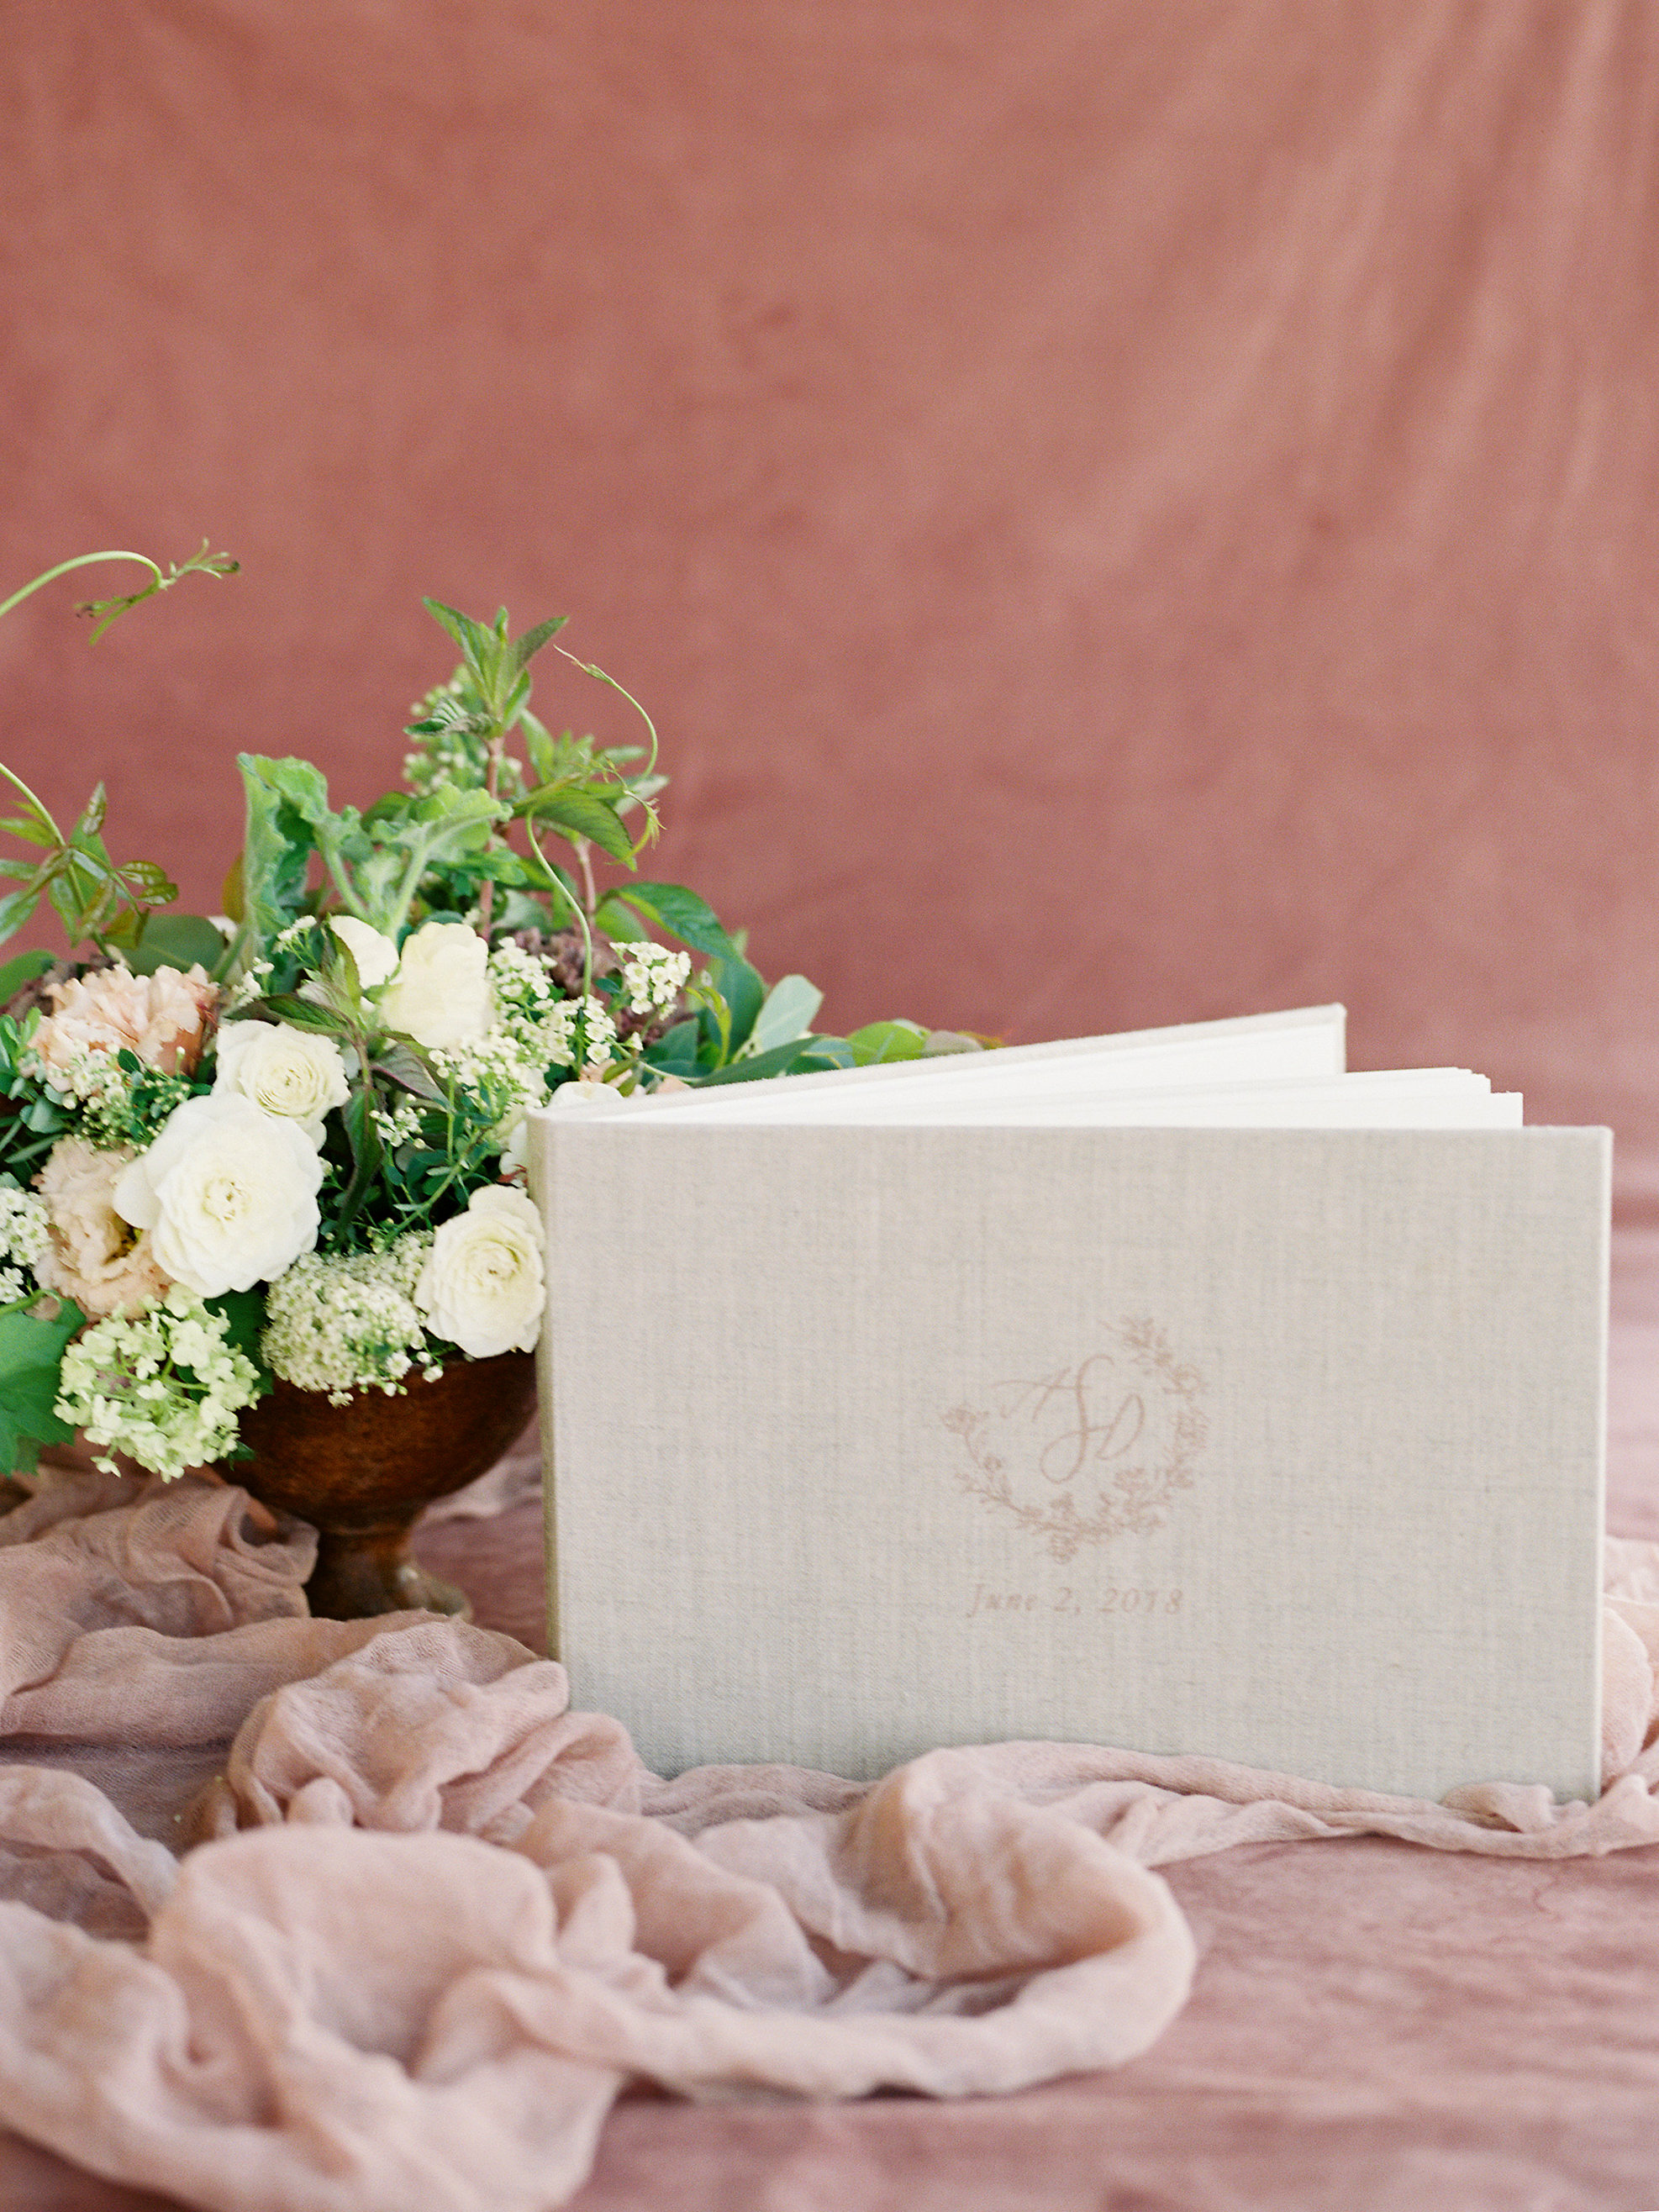 jessica-zimmerman-events-arkansas-mountain-wedding-ceremony-guest-book.jpg